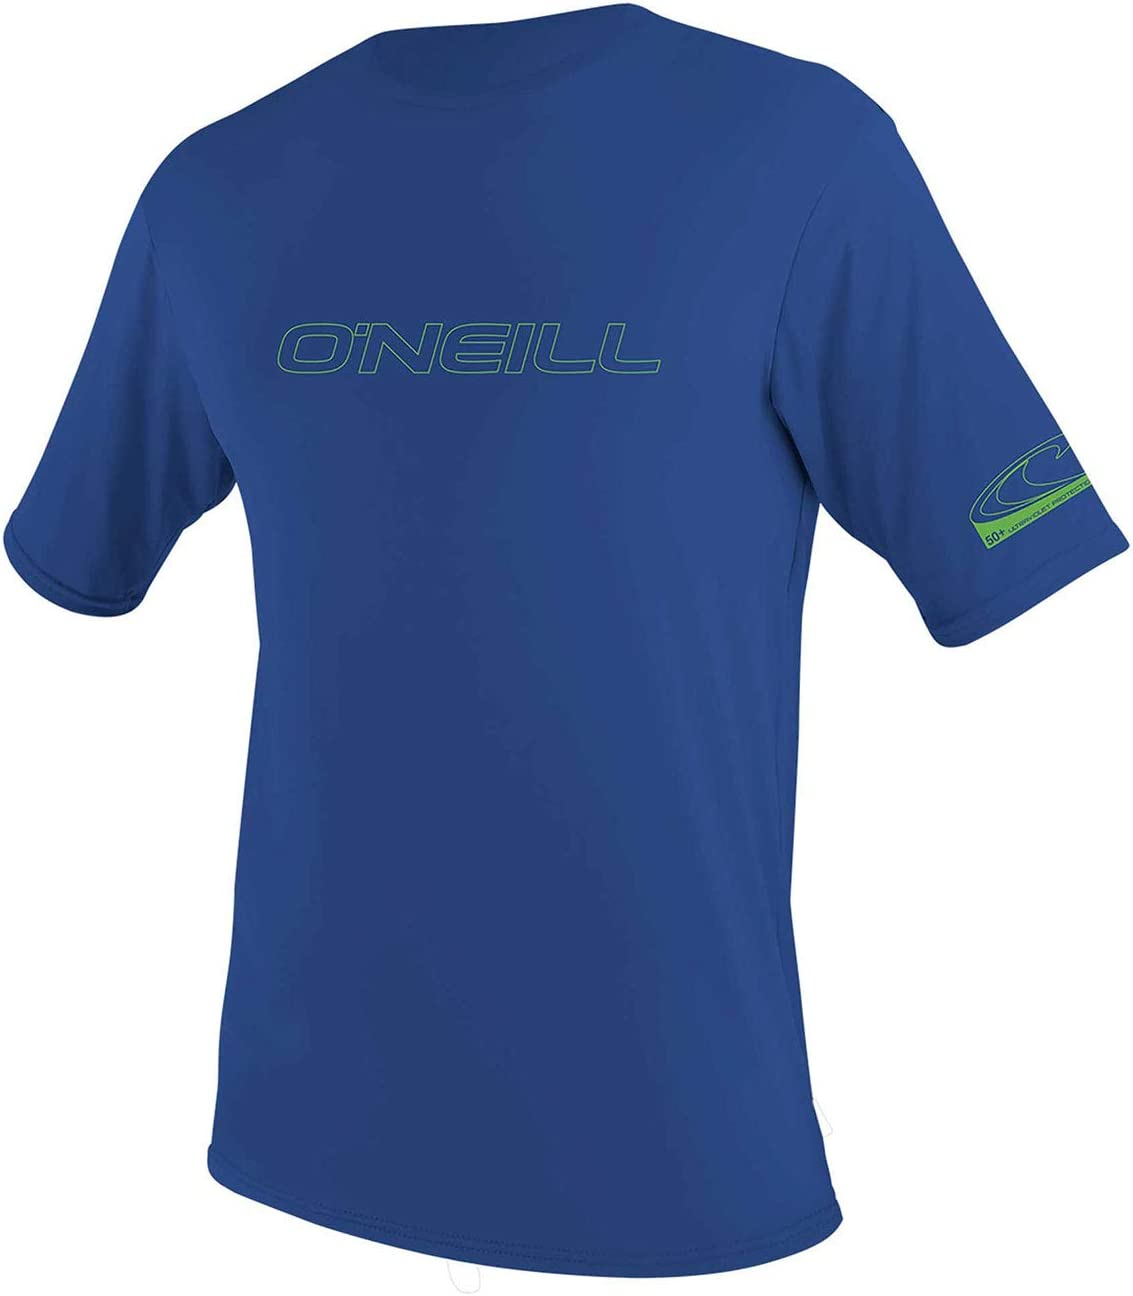 O'Neill Wetsuits Kids' O'neill Youth Basic Skins UPF 50+ Short Sleeve Rash Guard